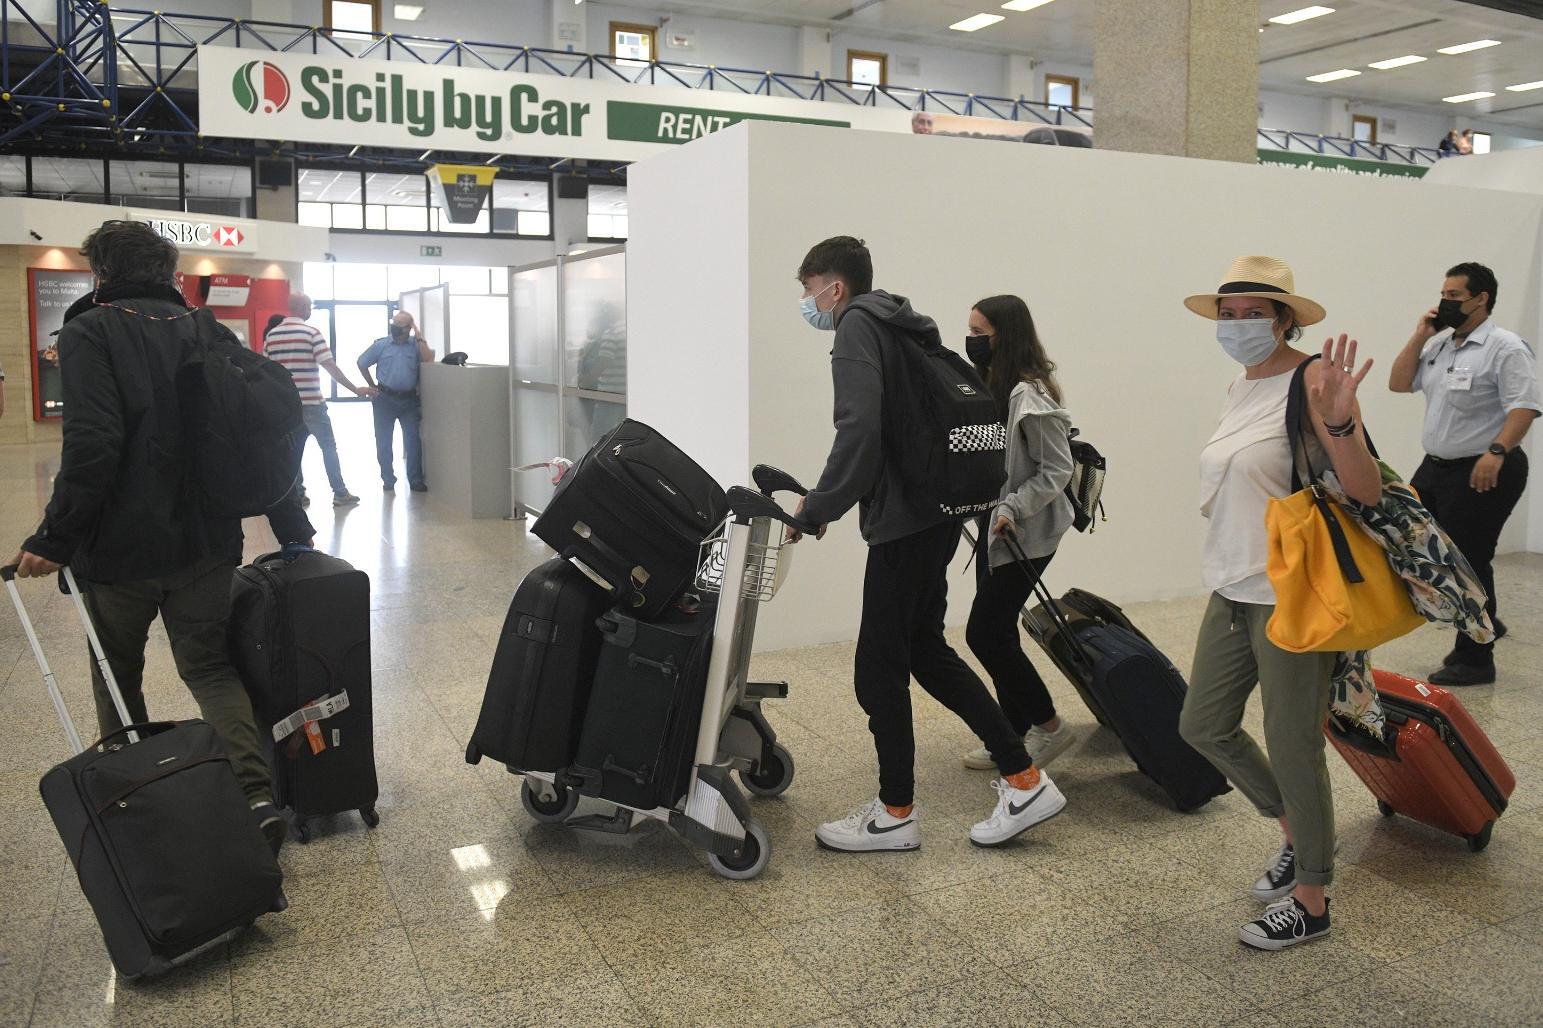 Tourists arrive at Malta International Airport as the tourist season opens, quietly. Photo: Matthew Mirabelli